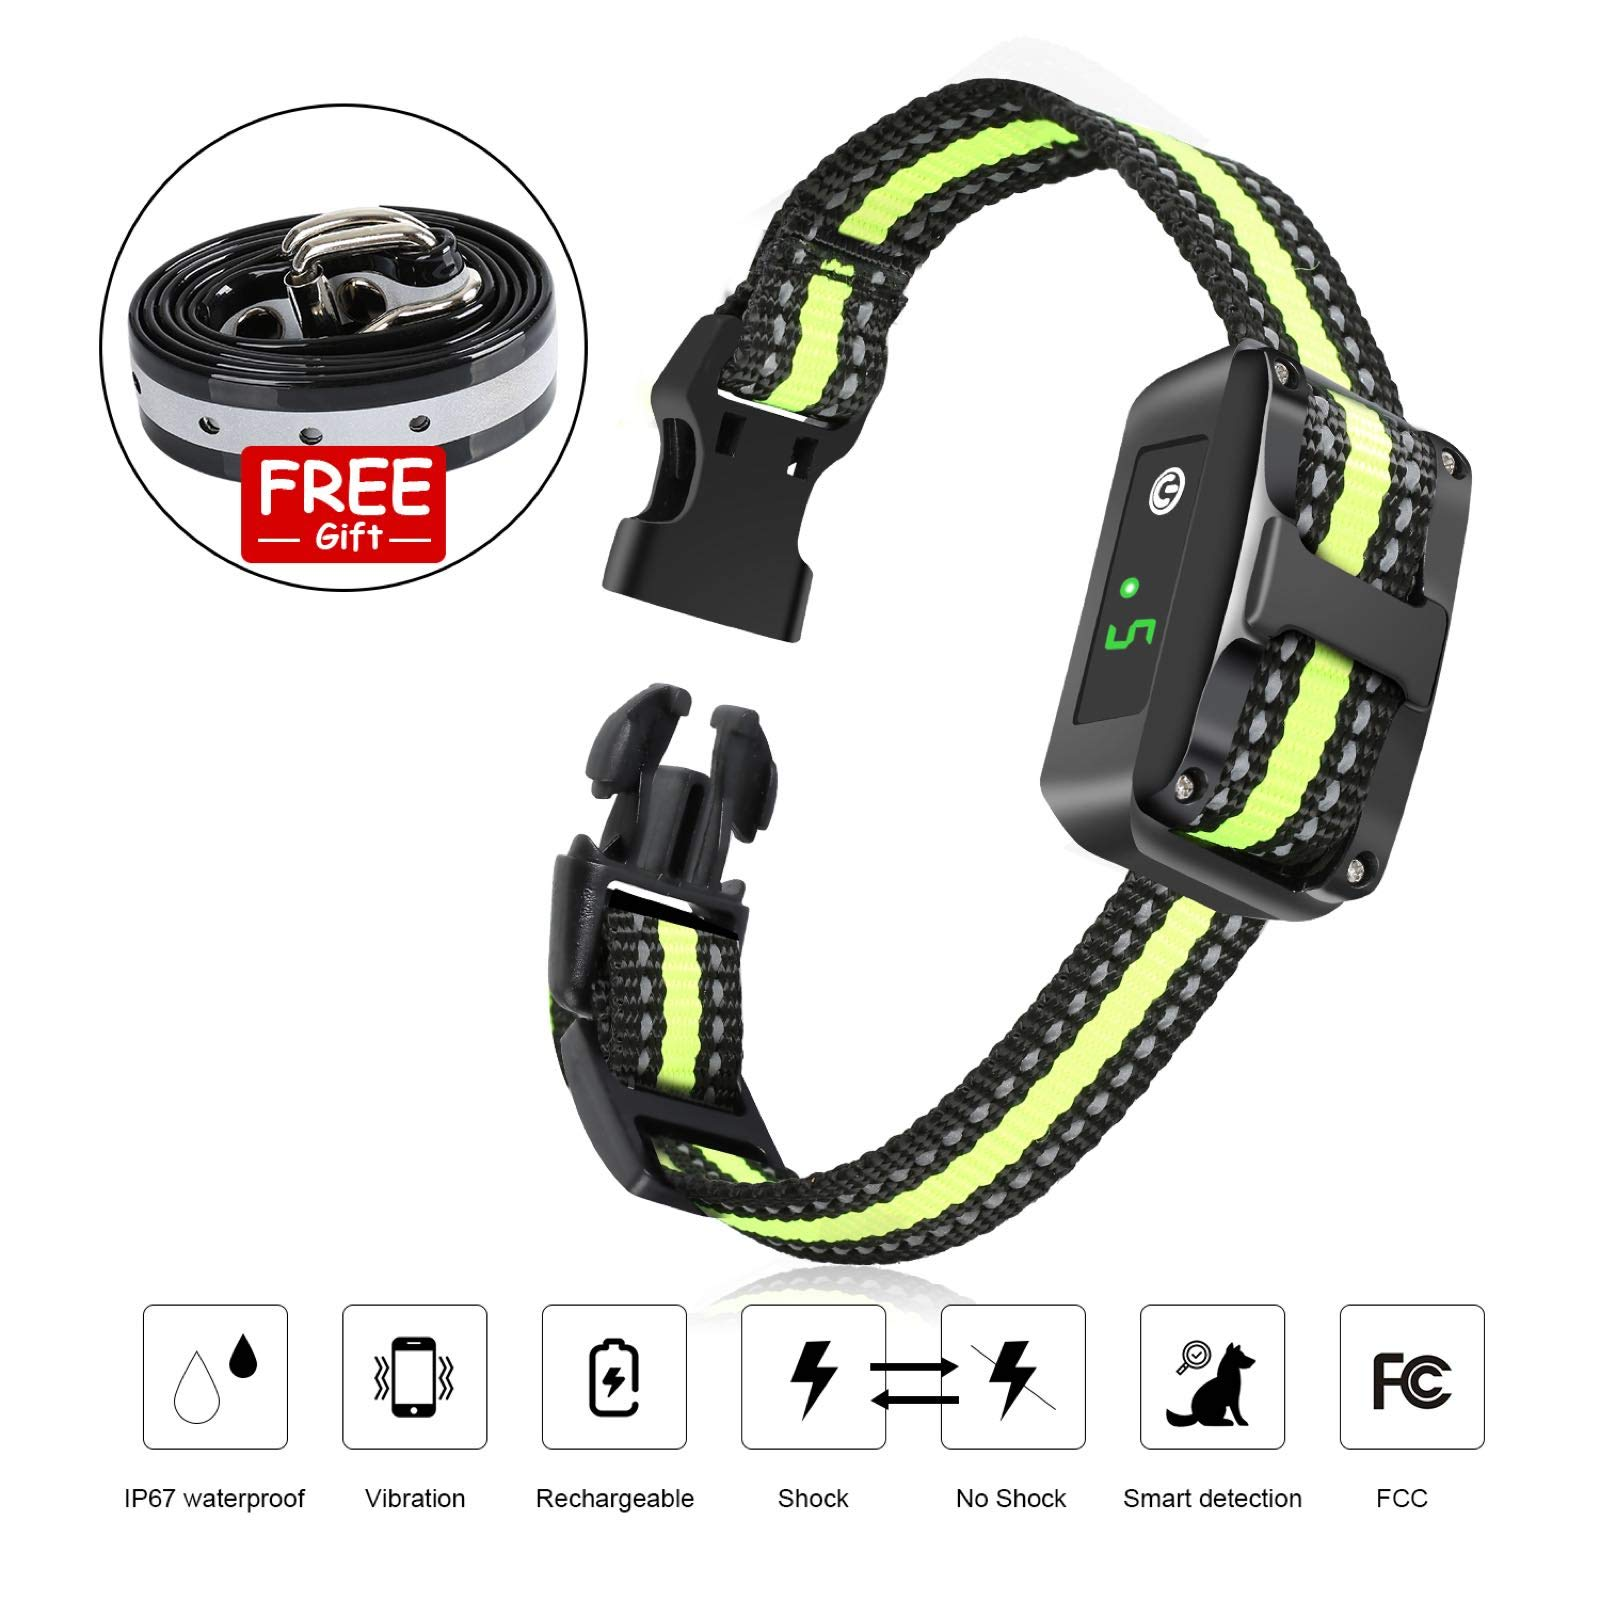 AOWIN Dog Bark Collar, 5 Adjustable Sensitivity and Intensity Levels Dual Anti Barking Modes Rechargeable Rainproof Reflective No Barking Control Dog Shock Collar for Small Medium Large Dog